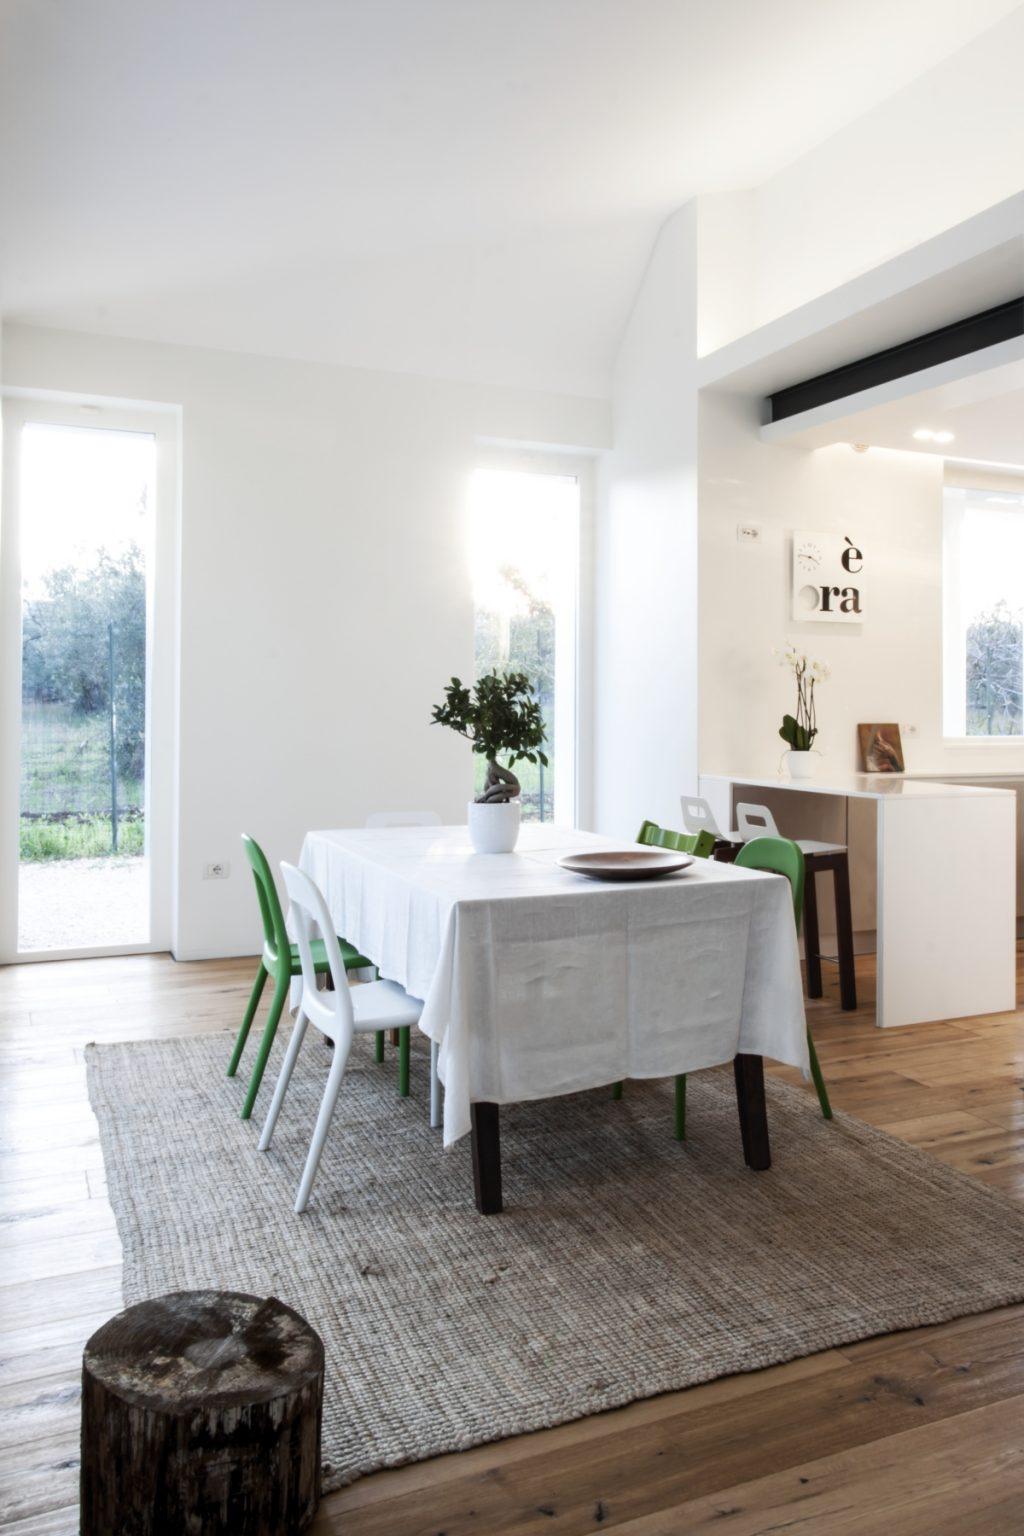 Villa PNK una casa sostenible Estudio m12 dC